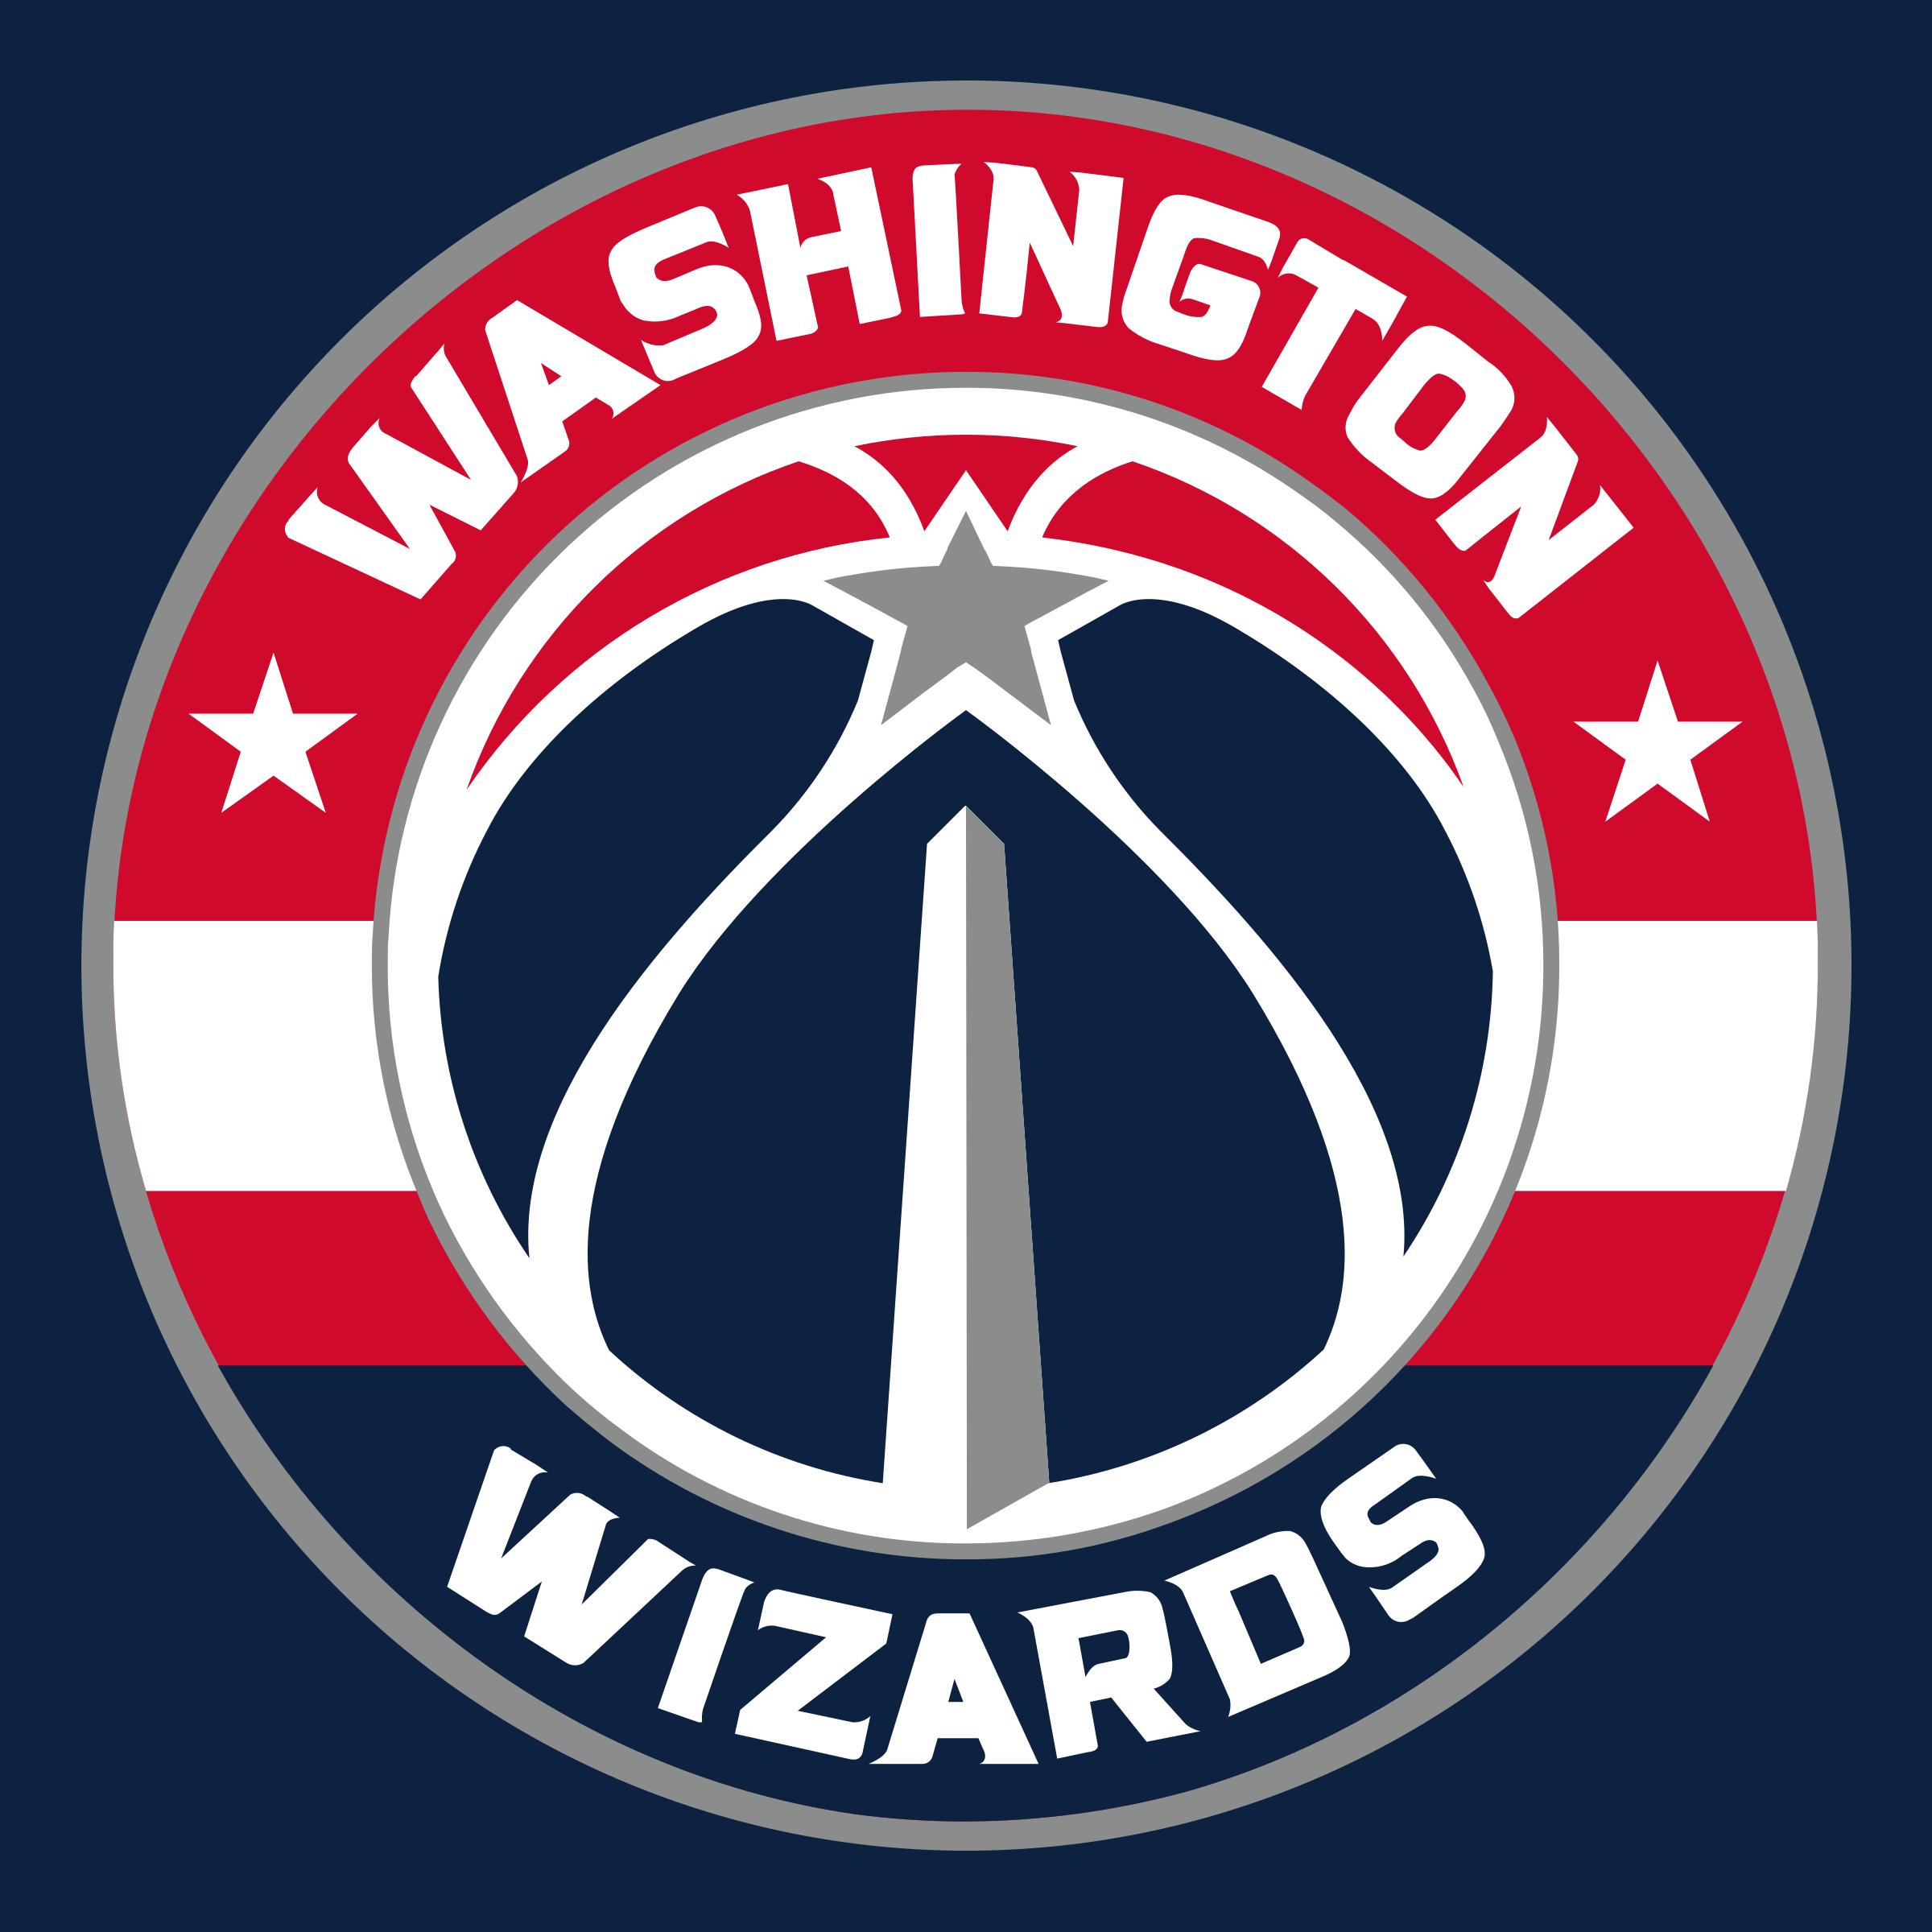 Washington Wizards Logo PNG Transparent & SVG Vector.